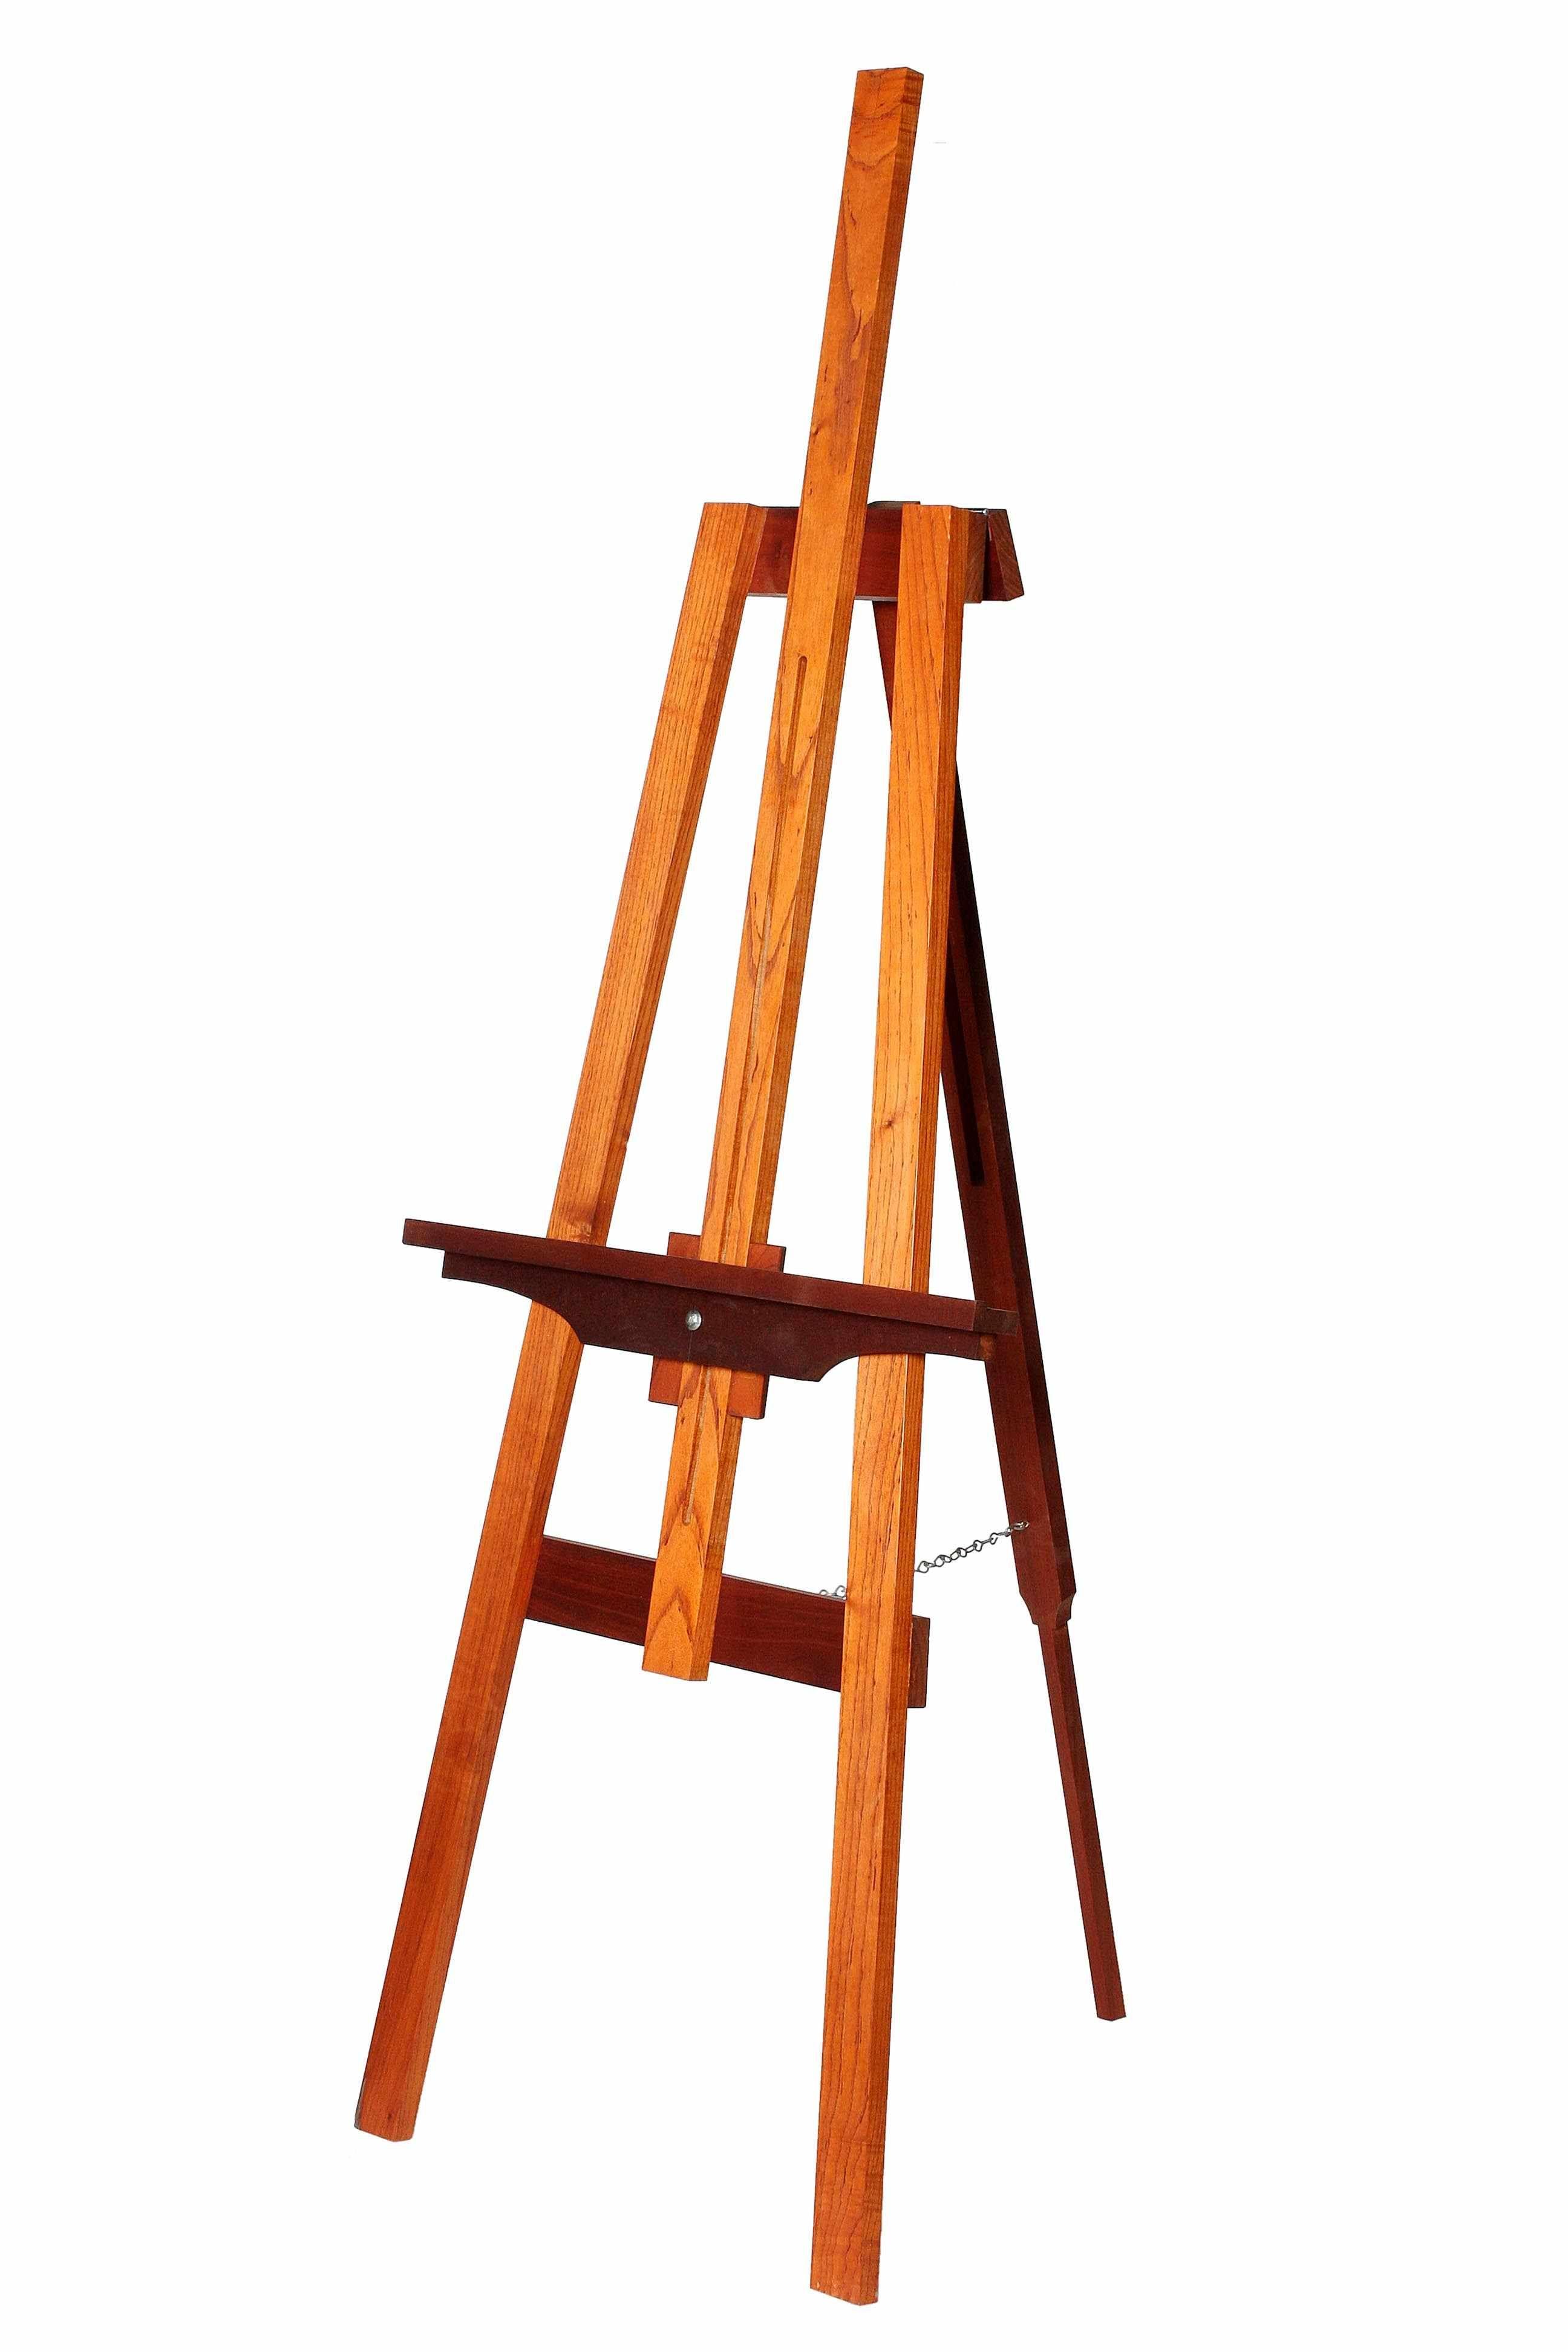 DIY Easel. For my creative girls. | Diy easel, Art easel ... on Easel Decorating Ideas  id=57187